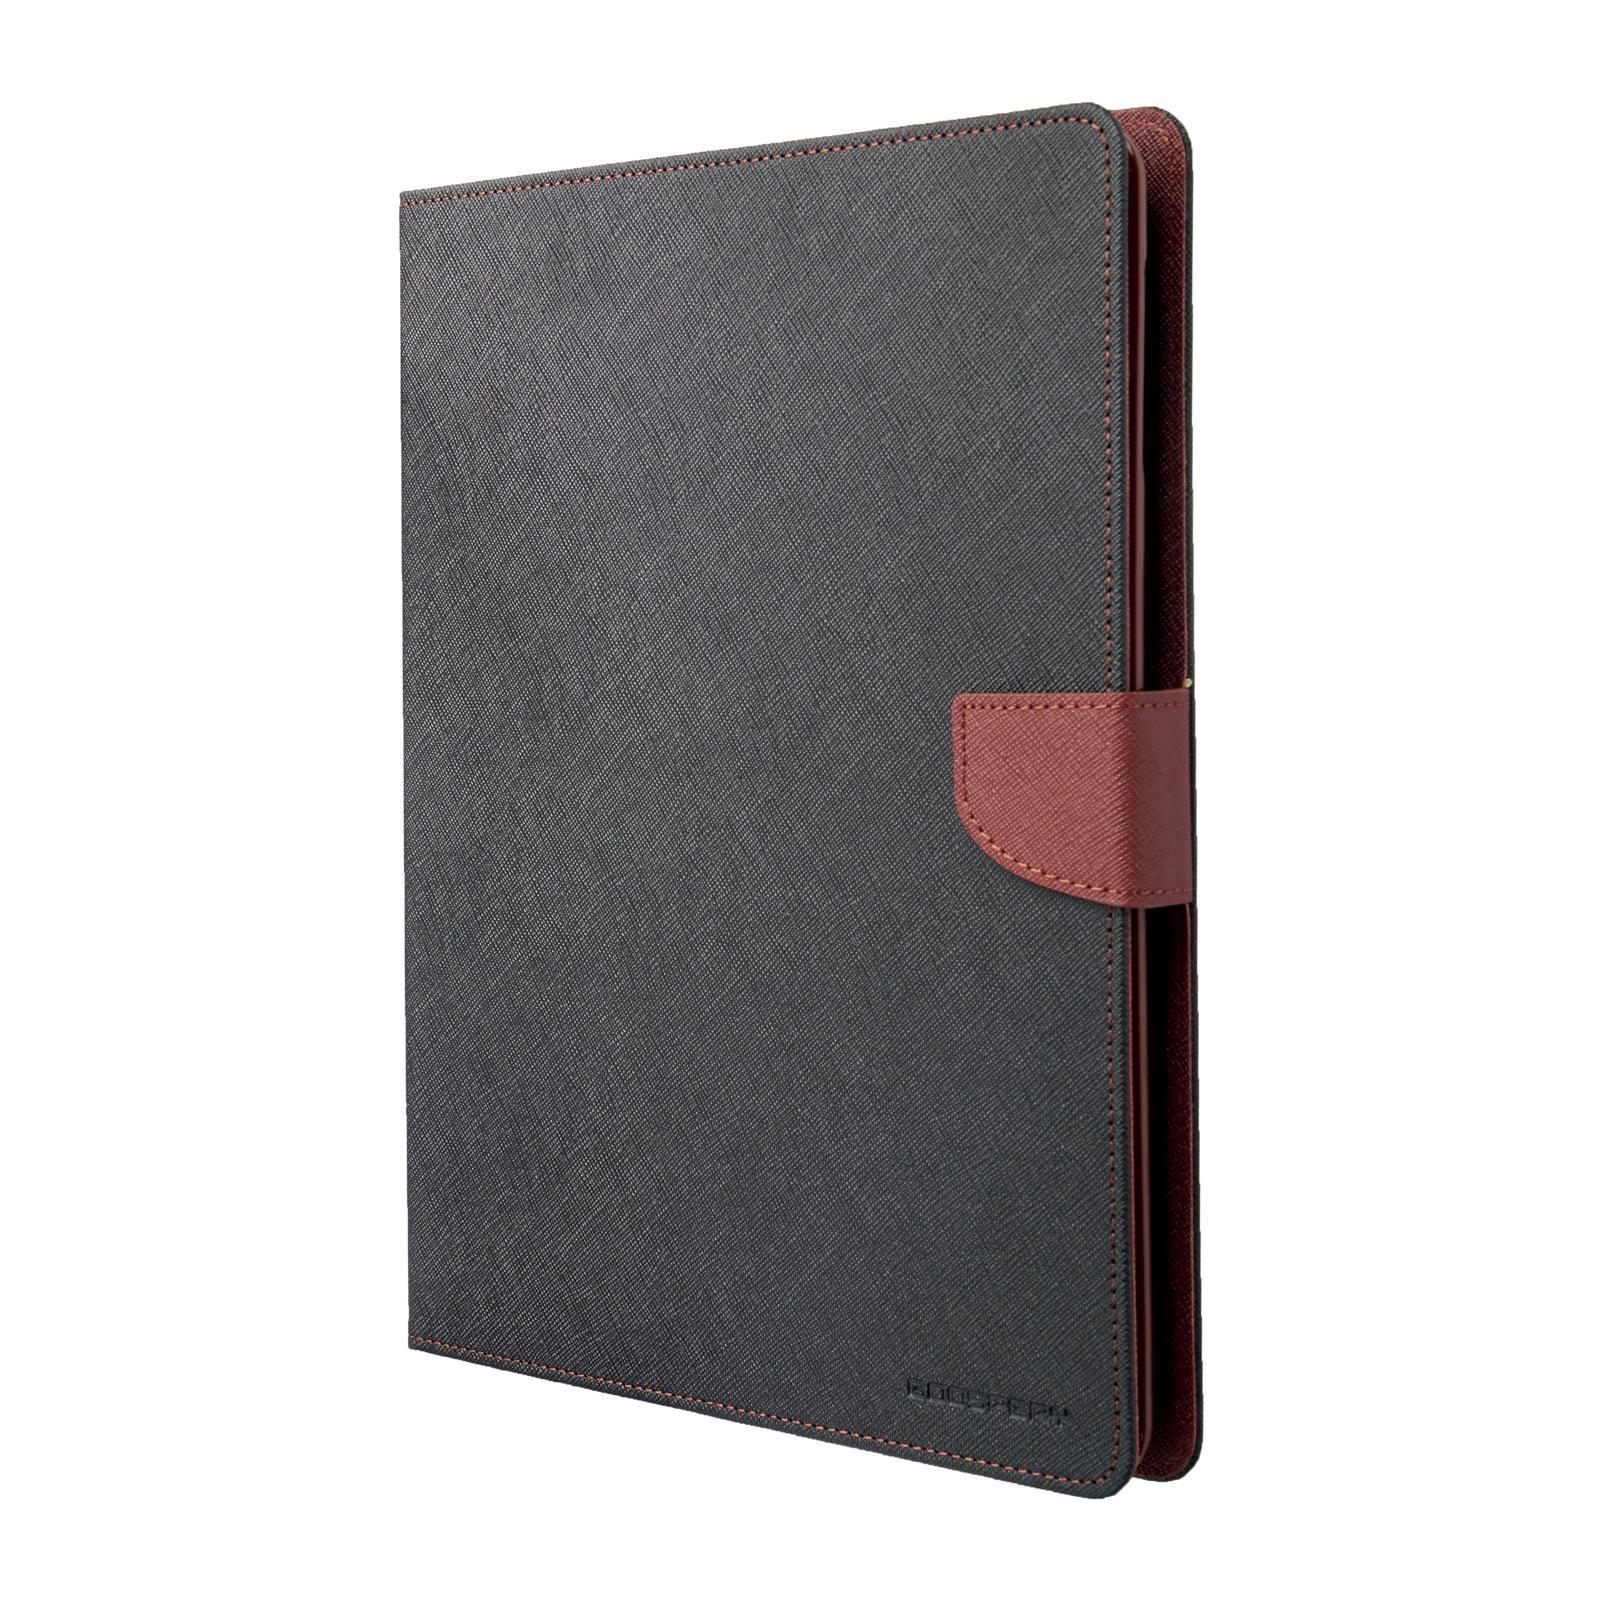 Pouzdro / kryt pro Apple iPad 2 / 3 / 4 - Mercury, Fancy Diary Black/Brown